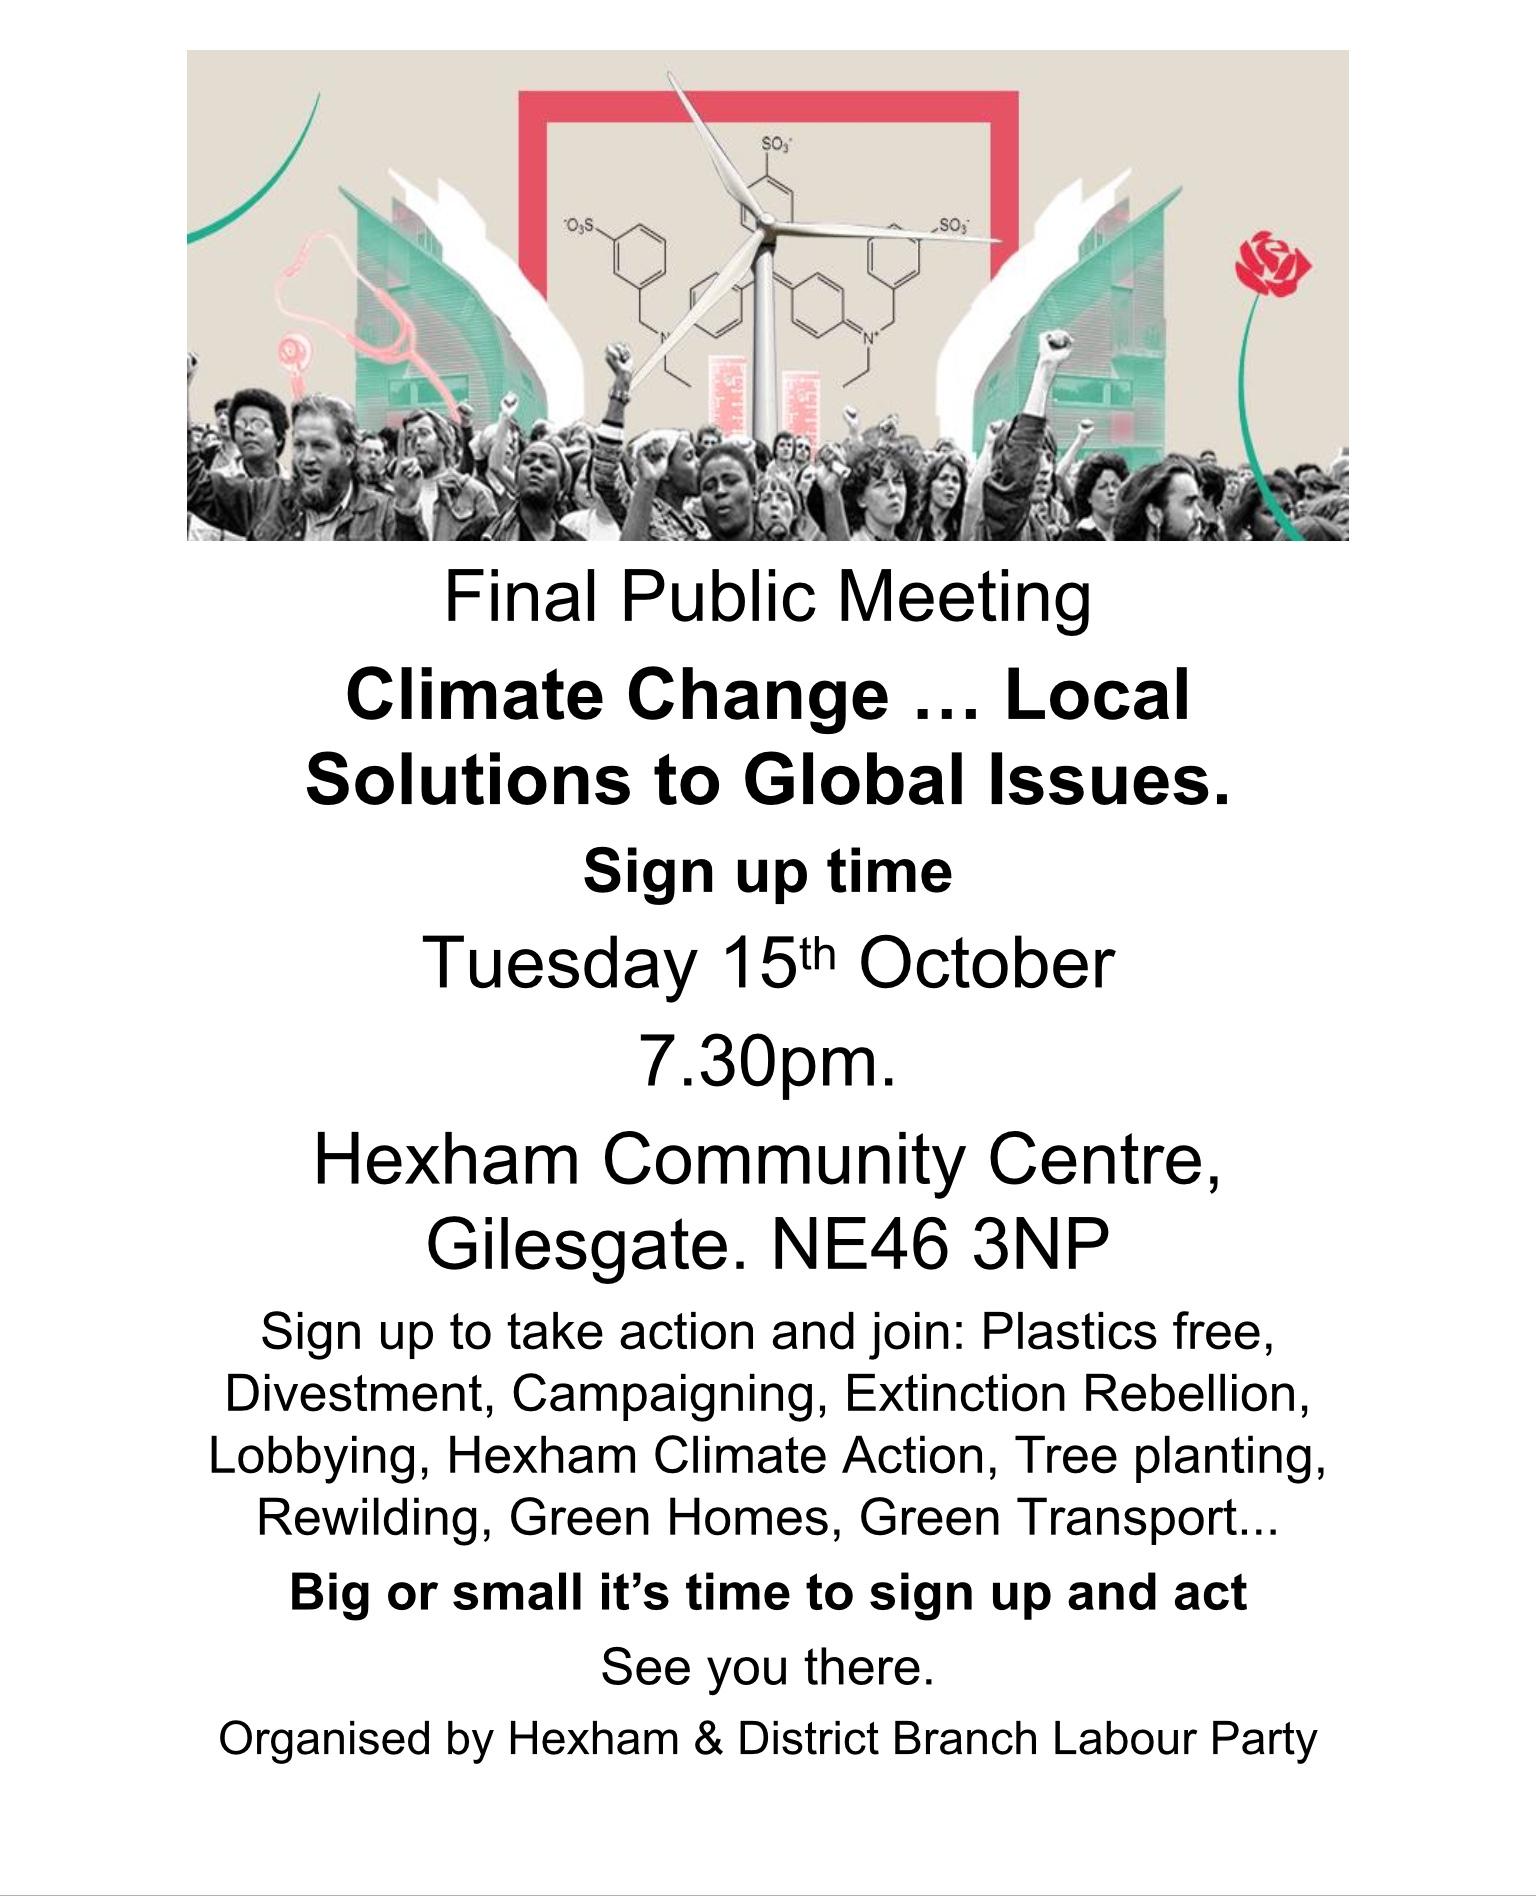 Climate Change Public Meeting